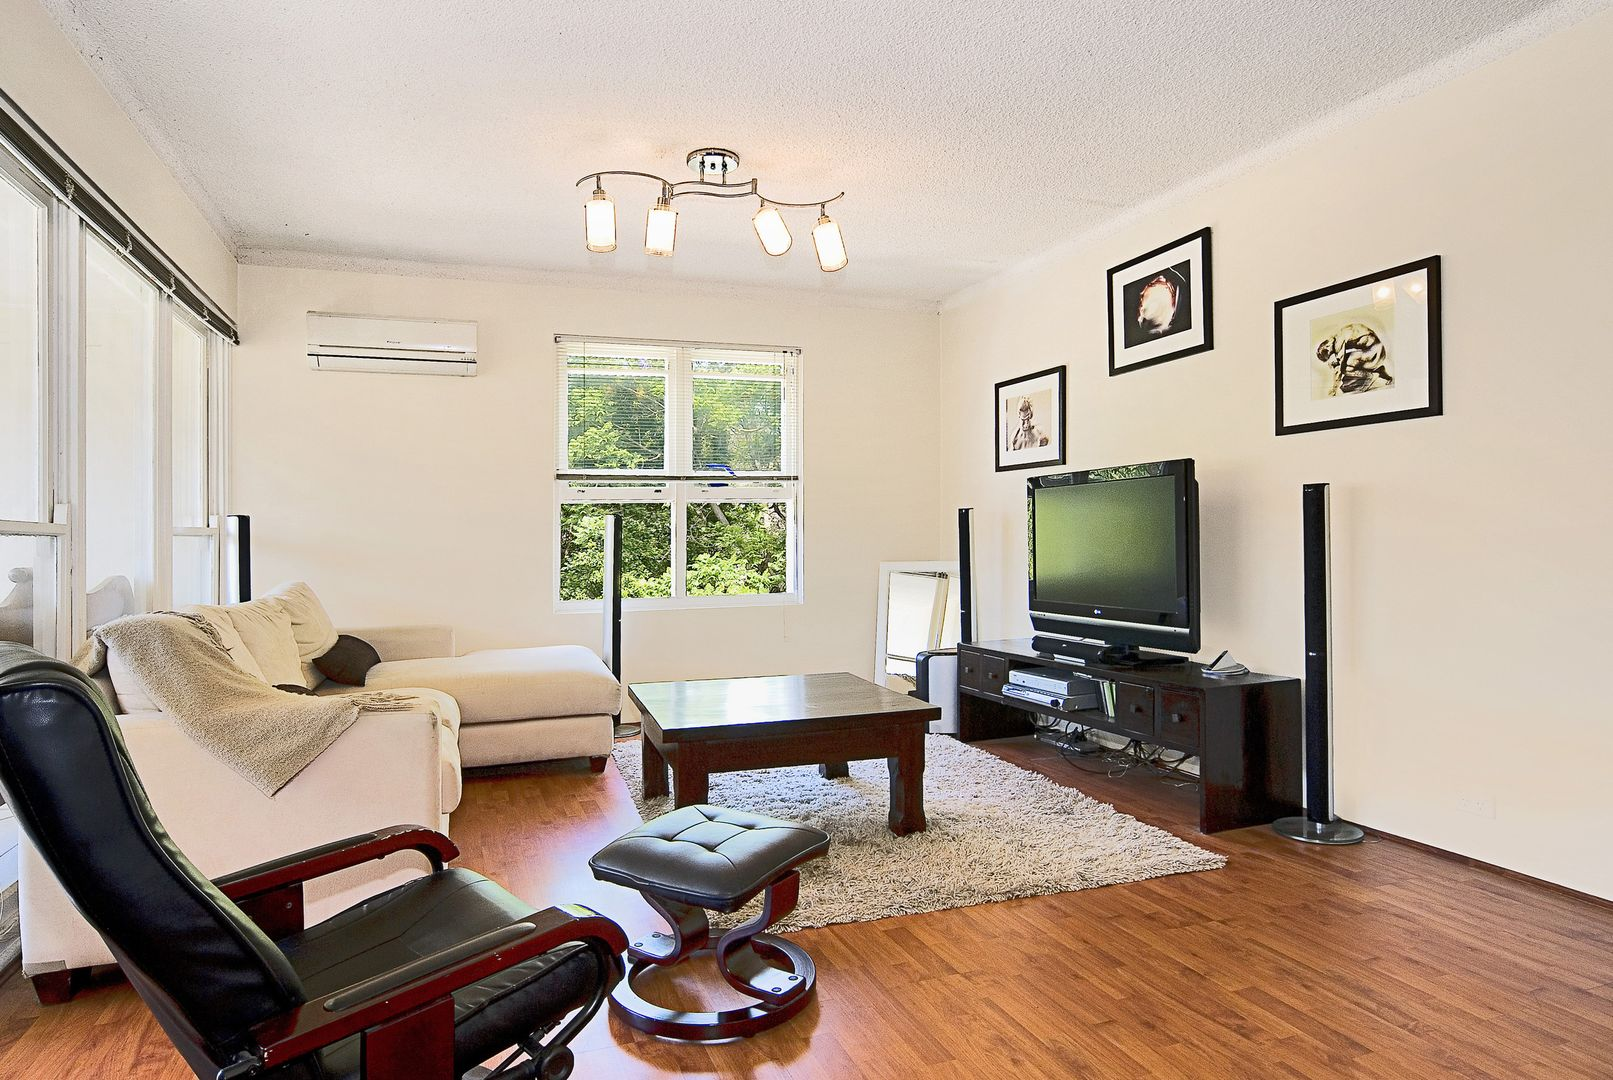 36/115 Alt Street, Ashfield NSW 2131, Image 0